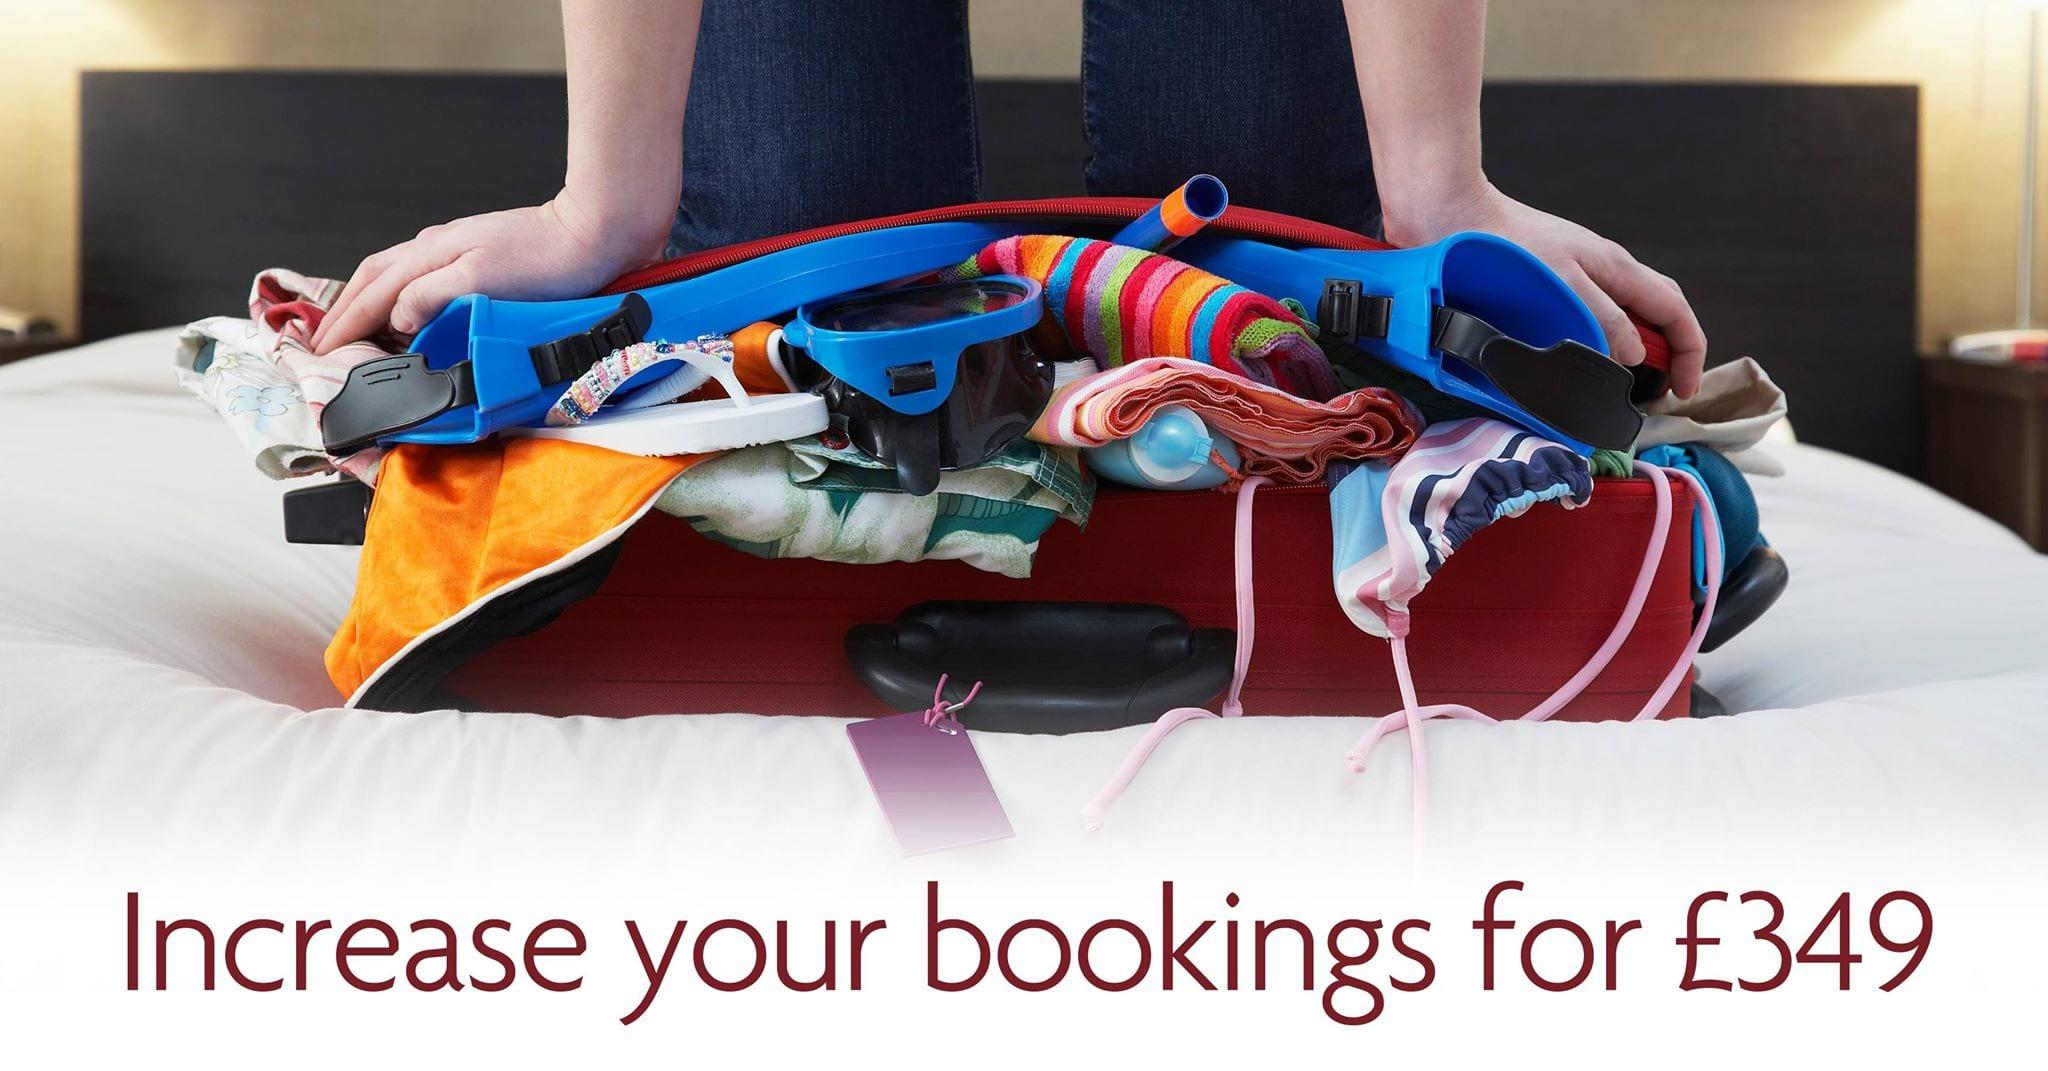 Increase Bookings OTA Hotel Optimisation